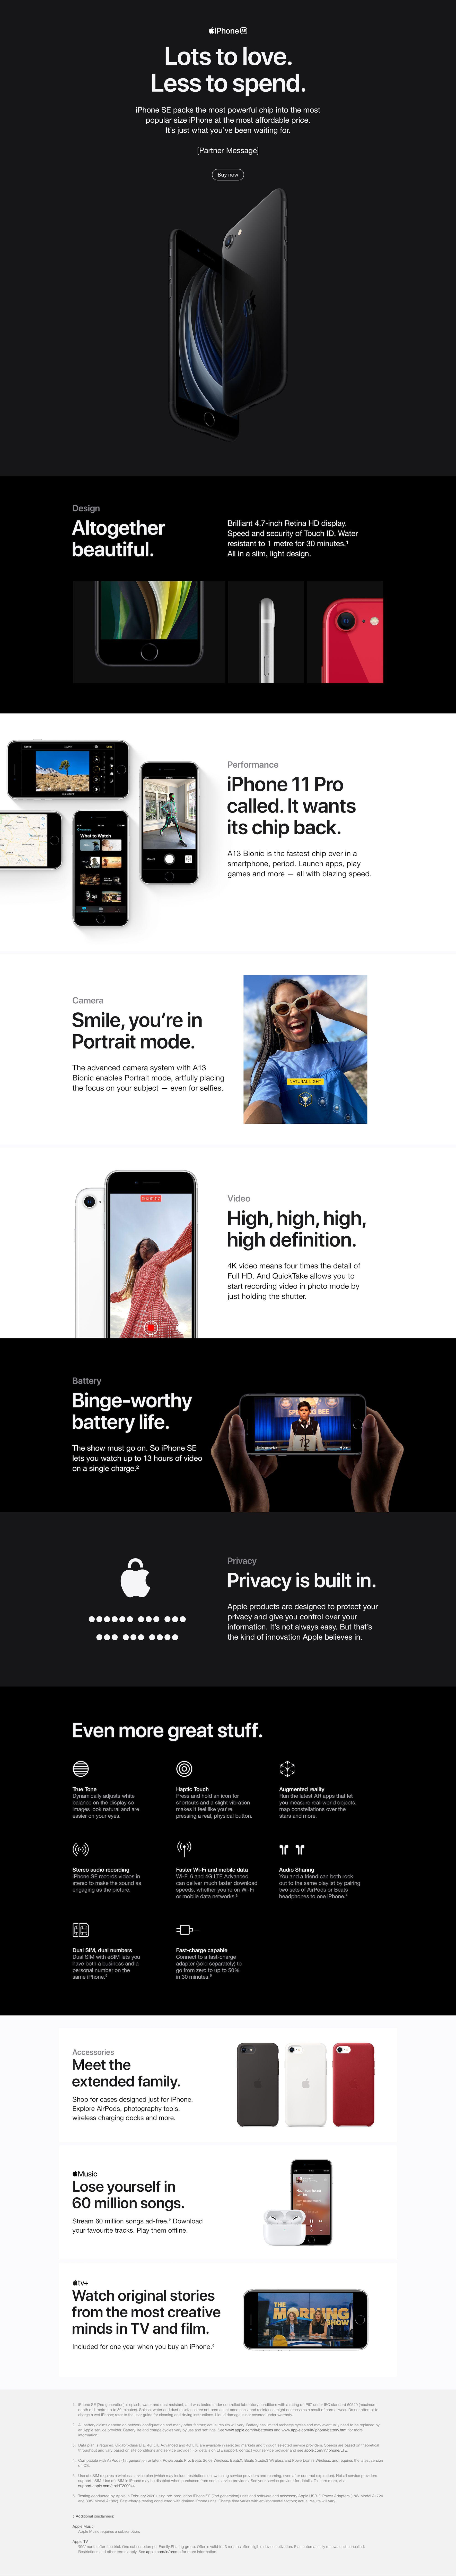 Buy Apple iPhone SE online in india